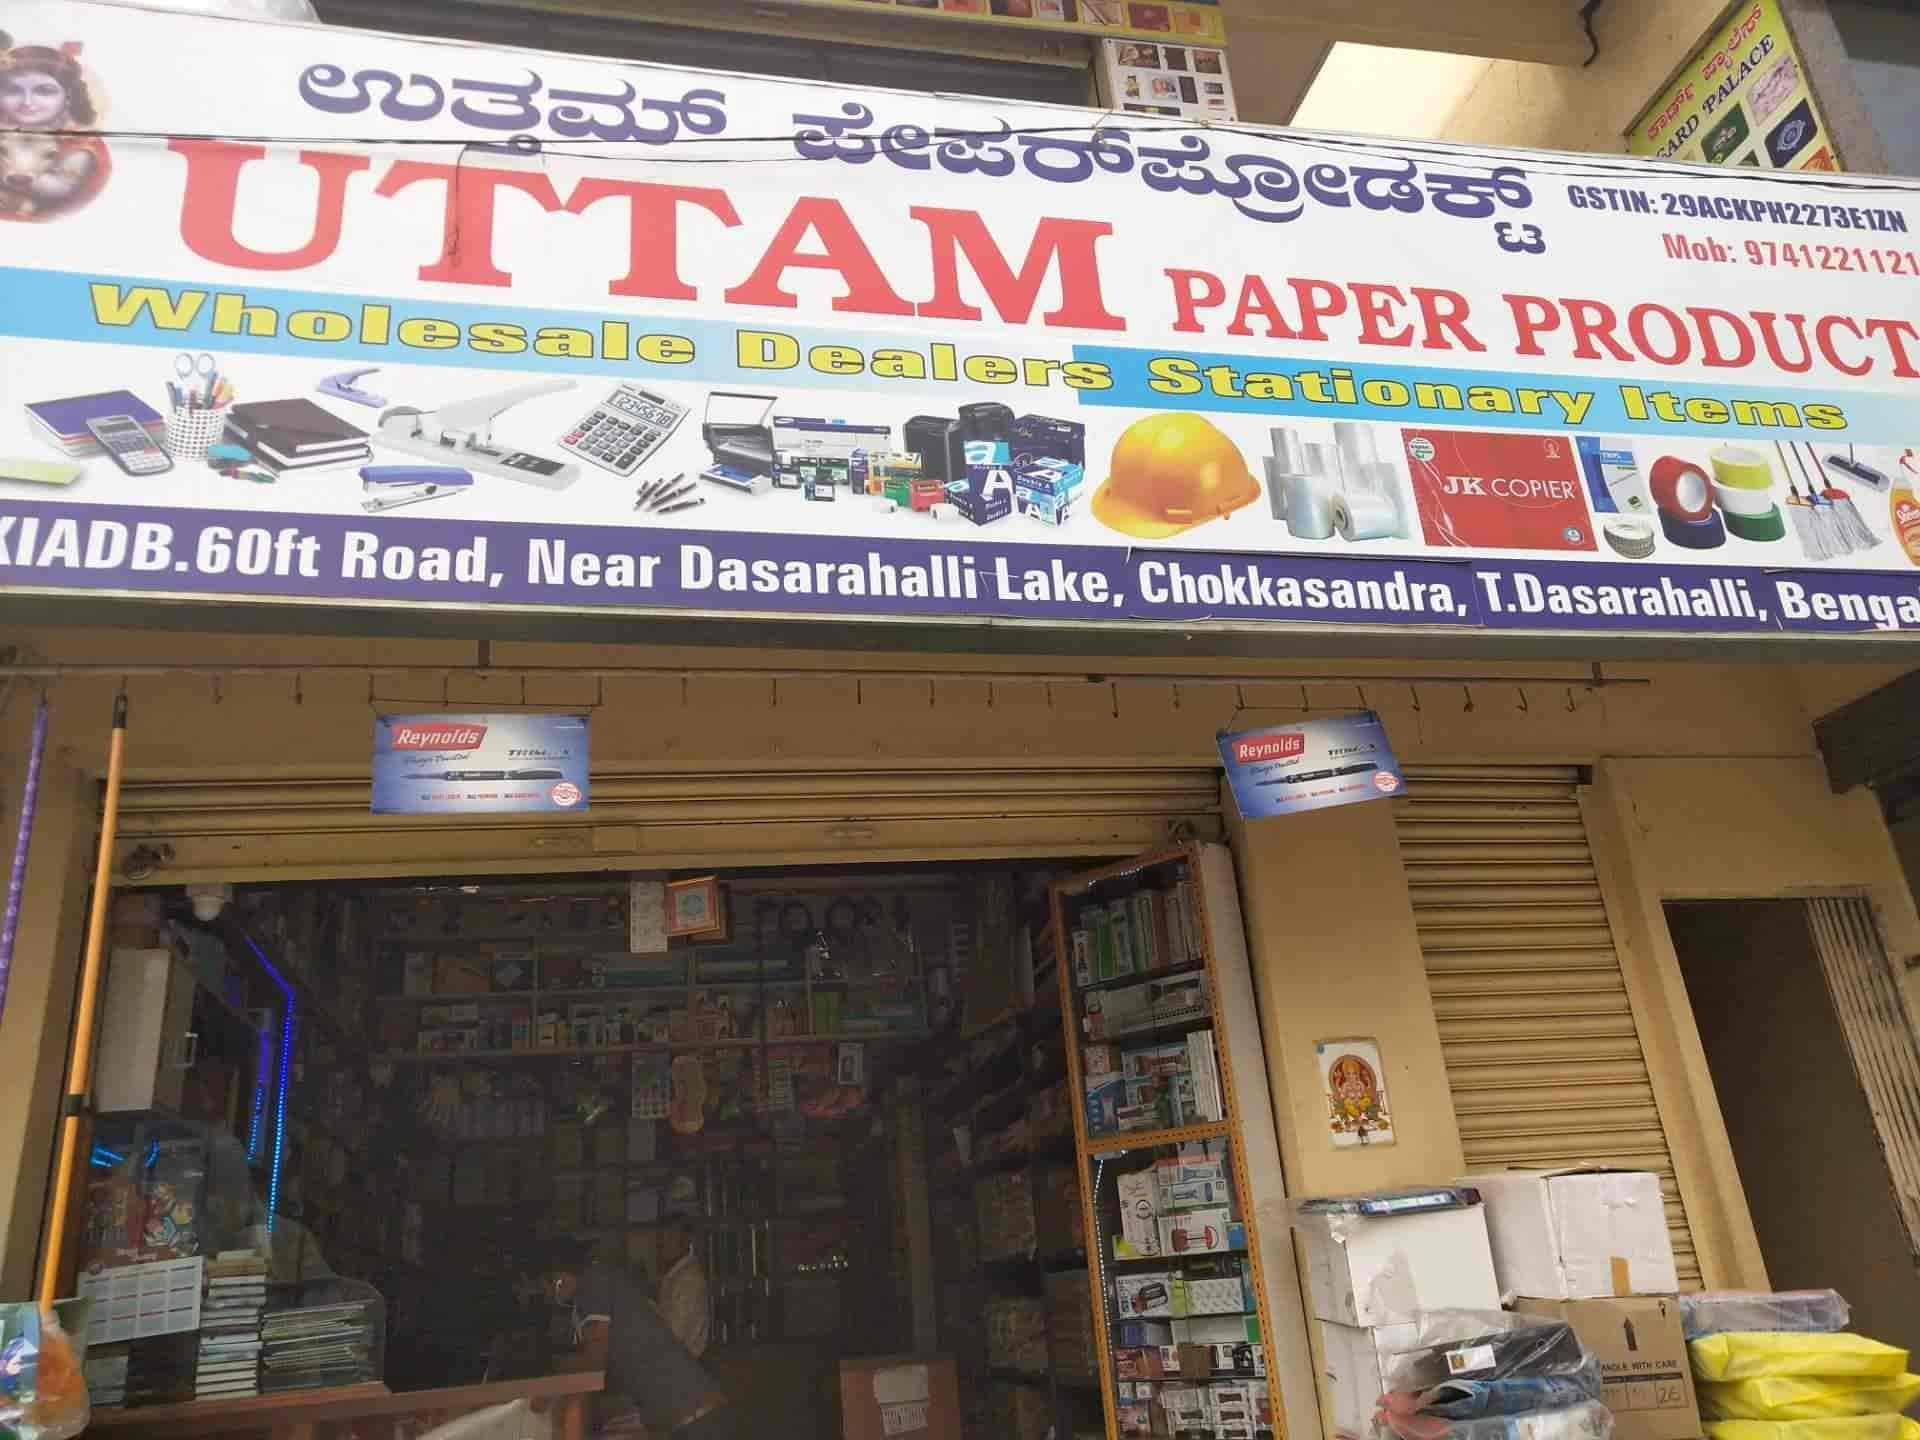 Wedding Card Dealers In Jayanagar Bangalore Wedding